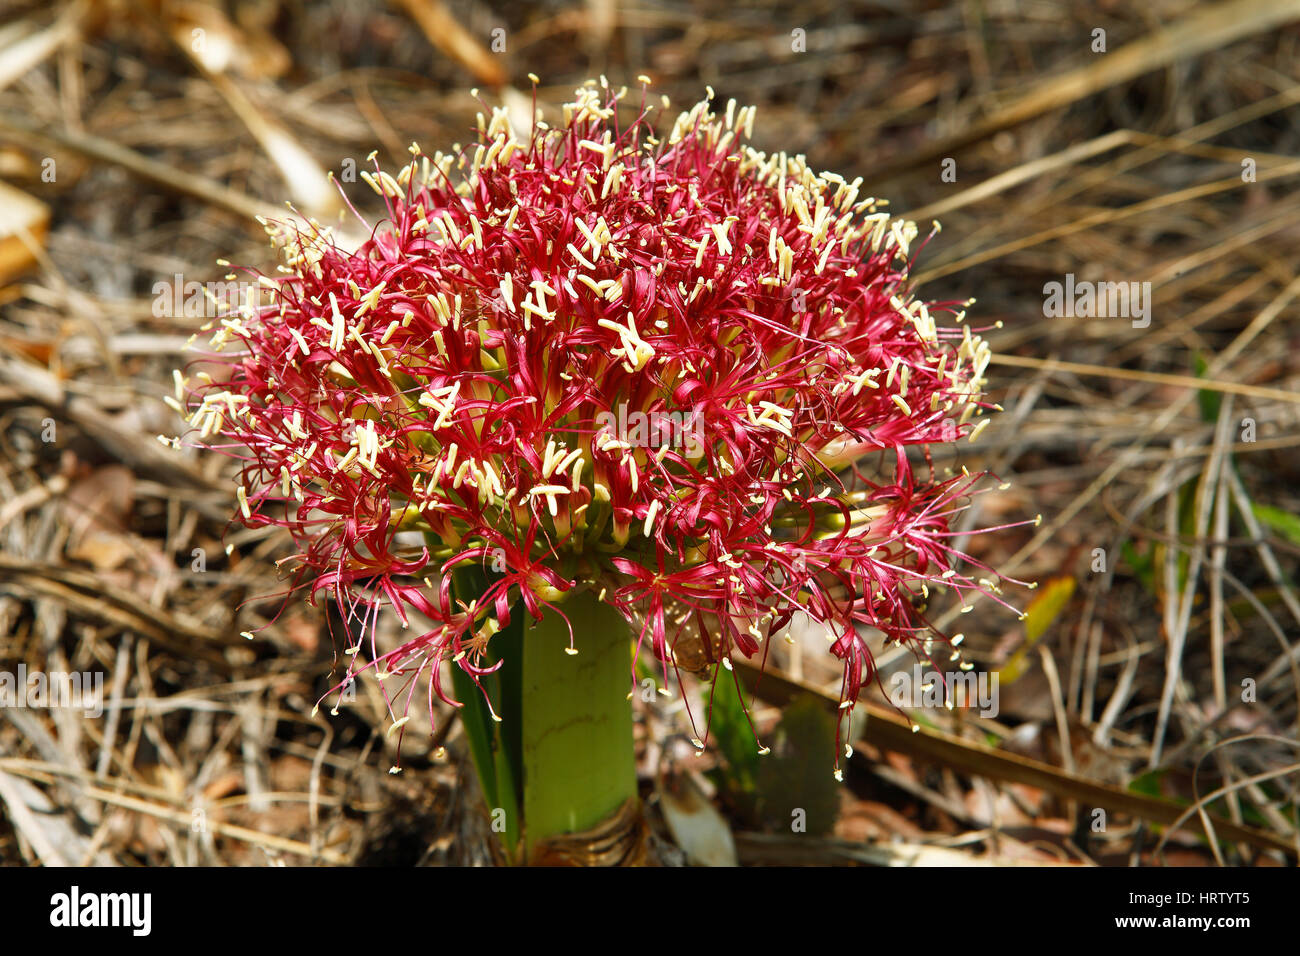 Flor de sangre (Lilly Haemanthus sanguineus), Parque Nacional de Liuwa liso, Zambia Foto de stock